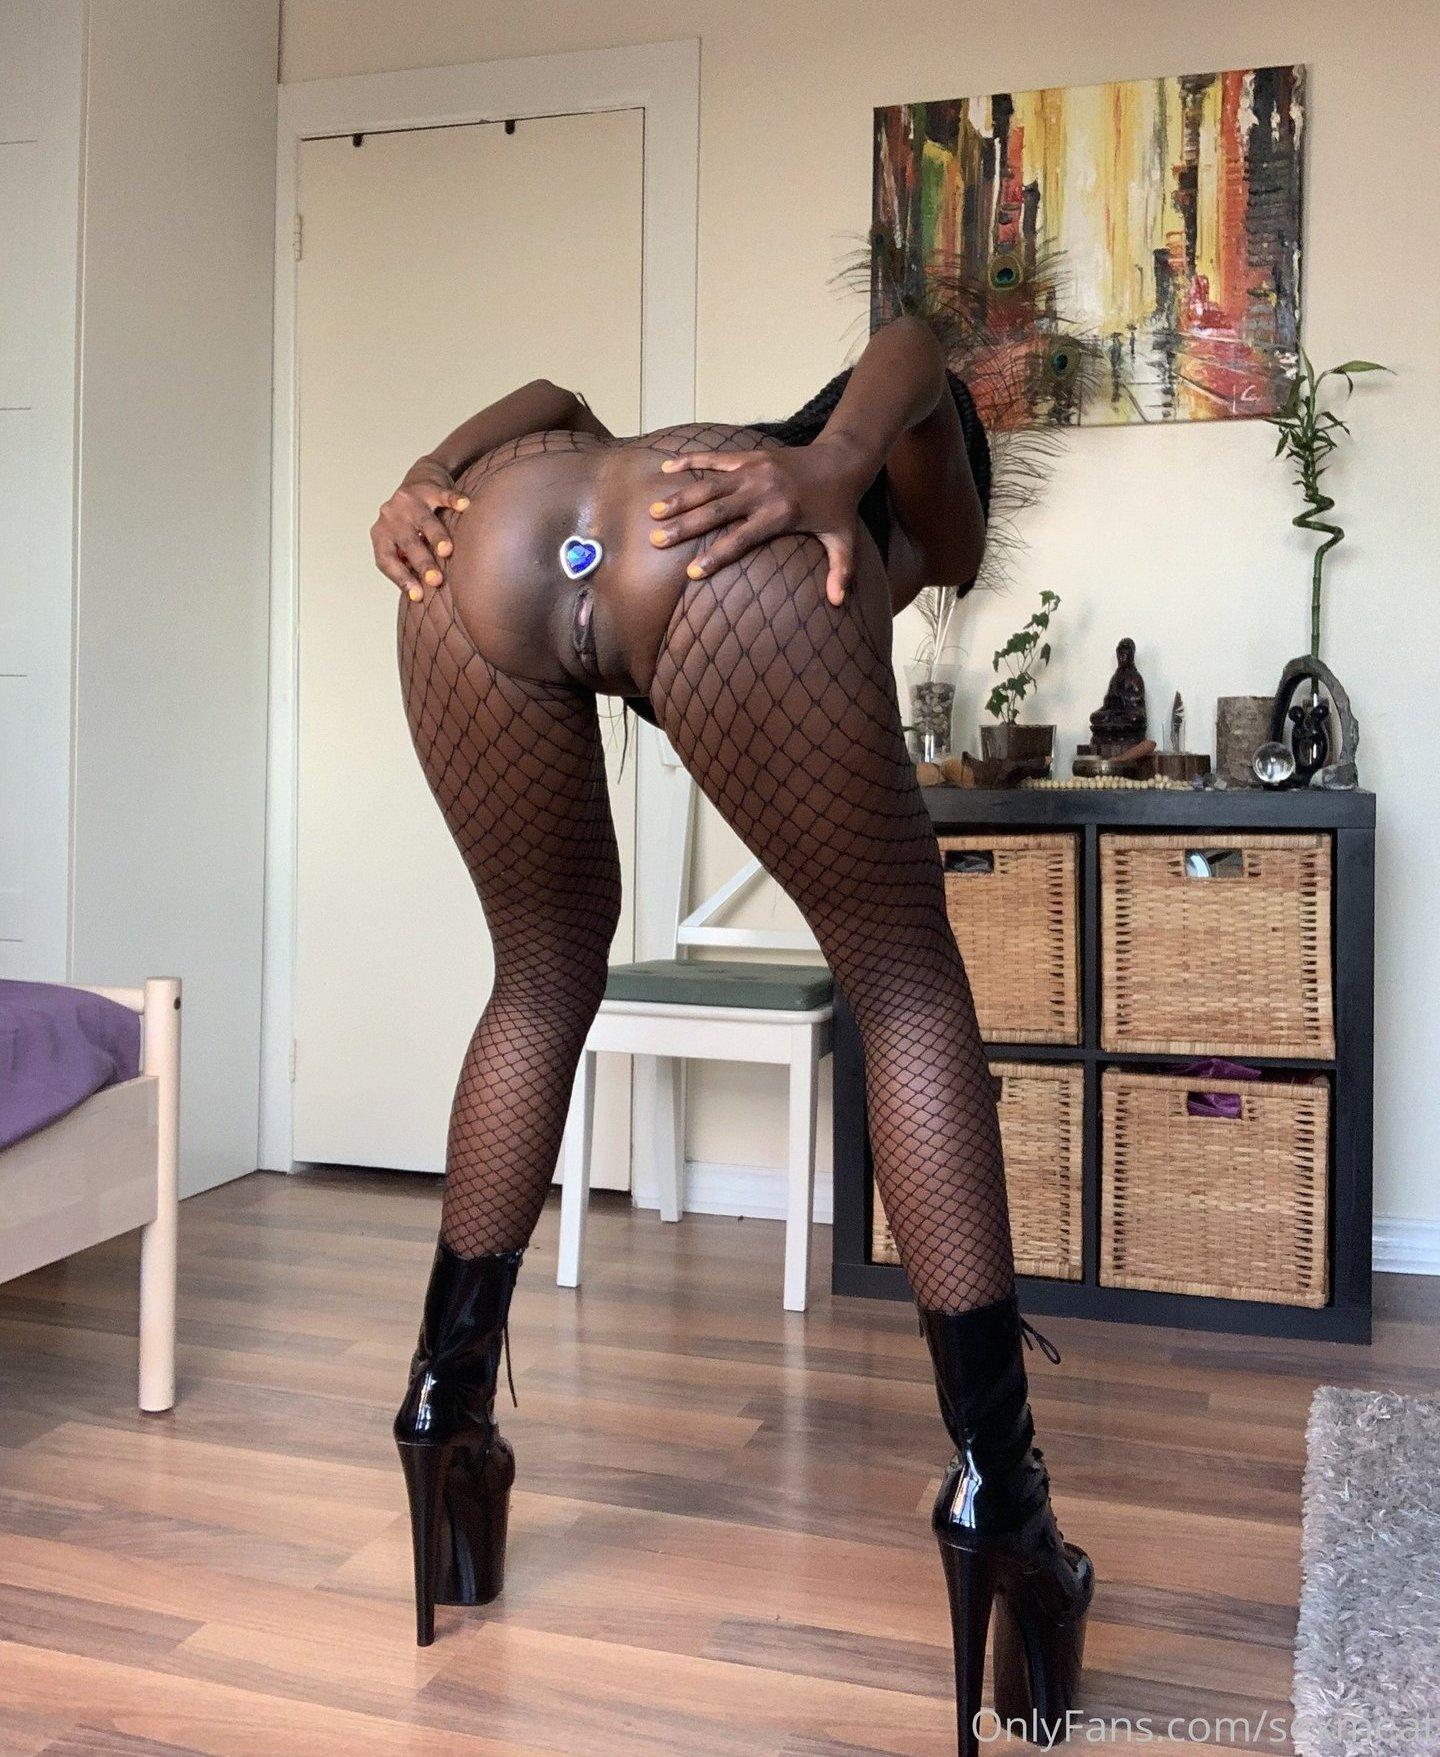 Sexmeat Sluttysexmeat Onlyfans Nude Leaks (39 Photos) Nudostar0007